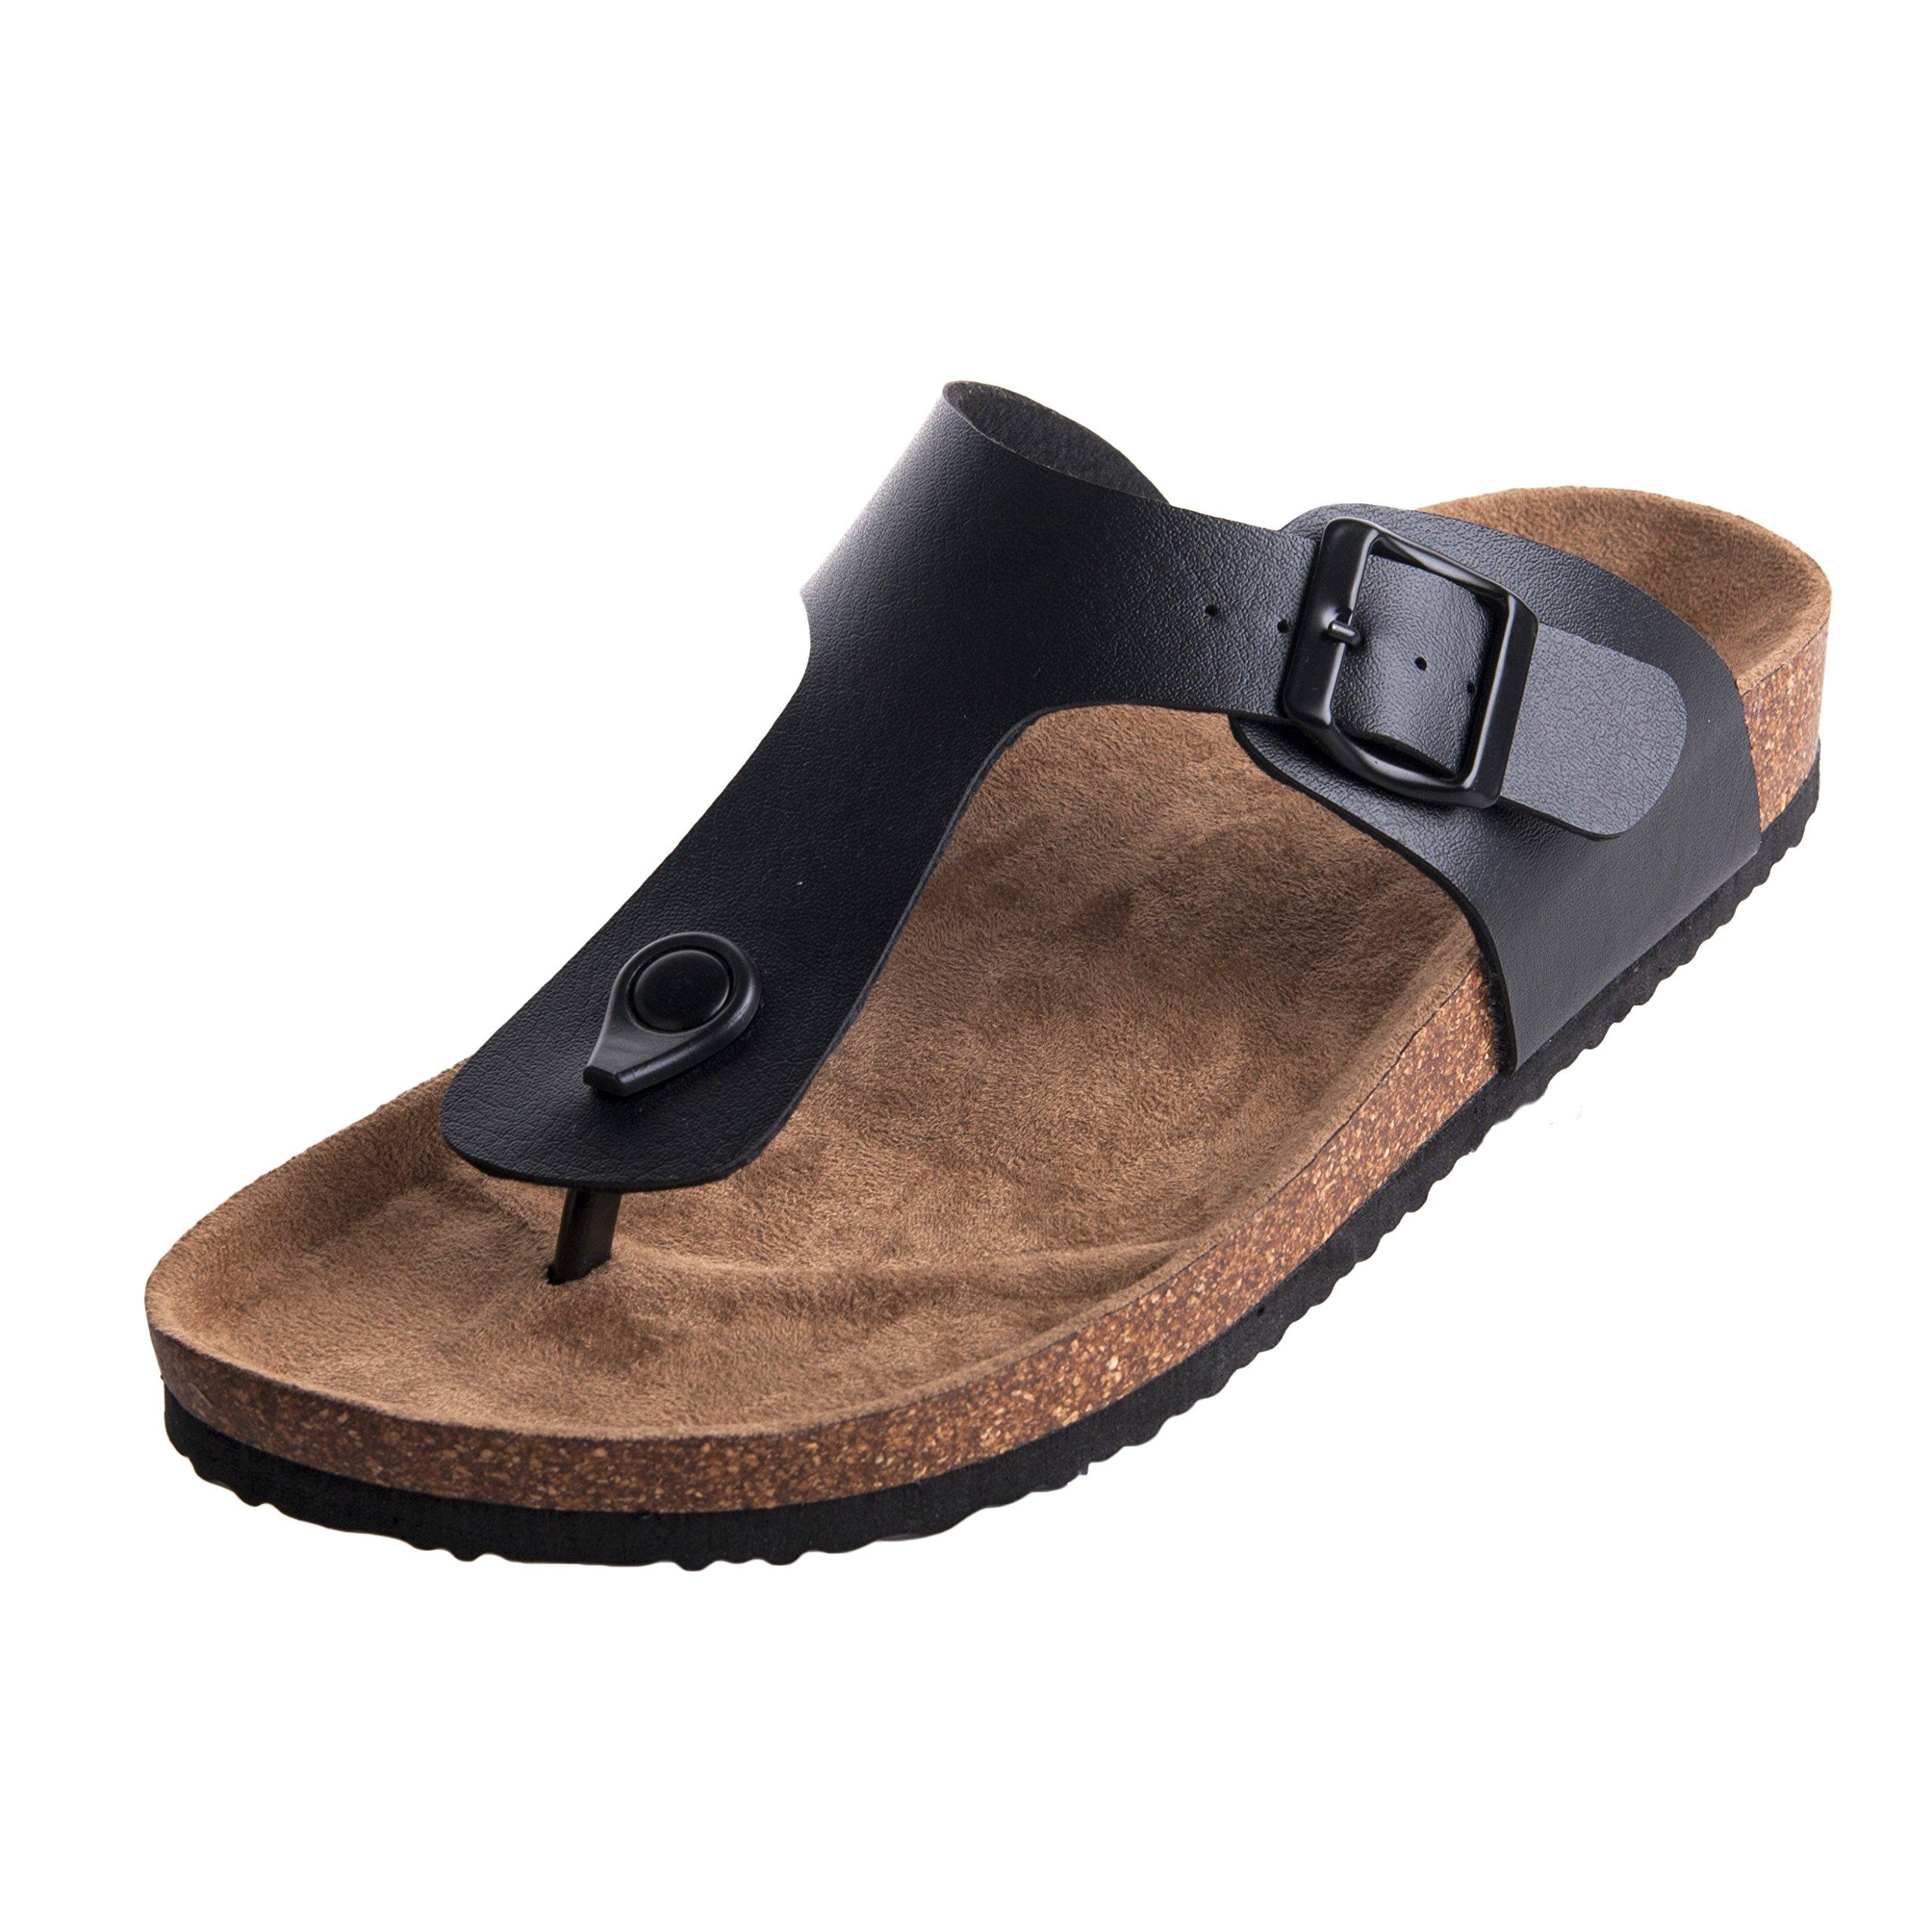 WTW Women's Cork Footbed Sandals Size 10